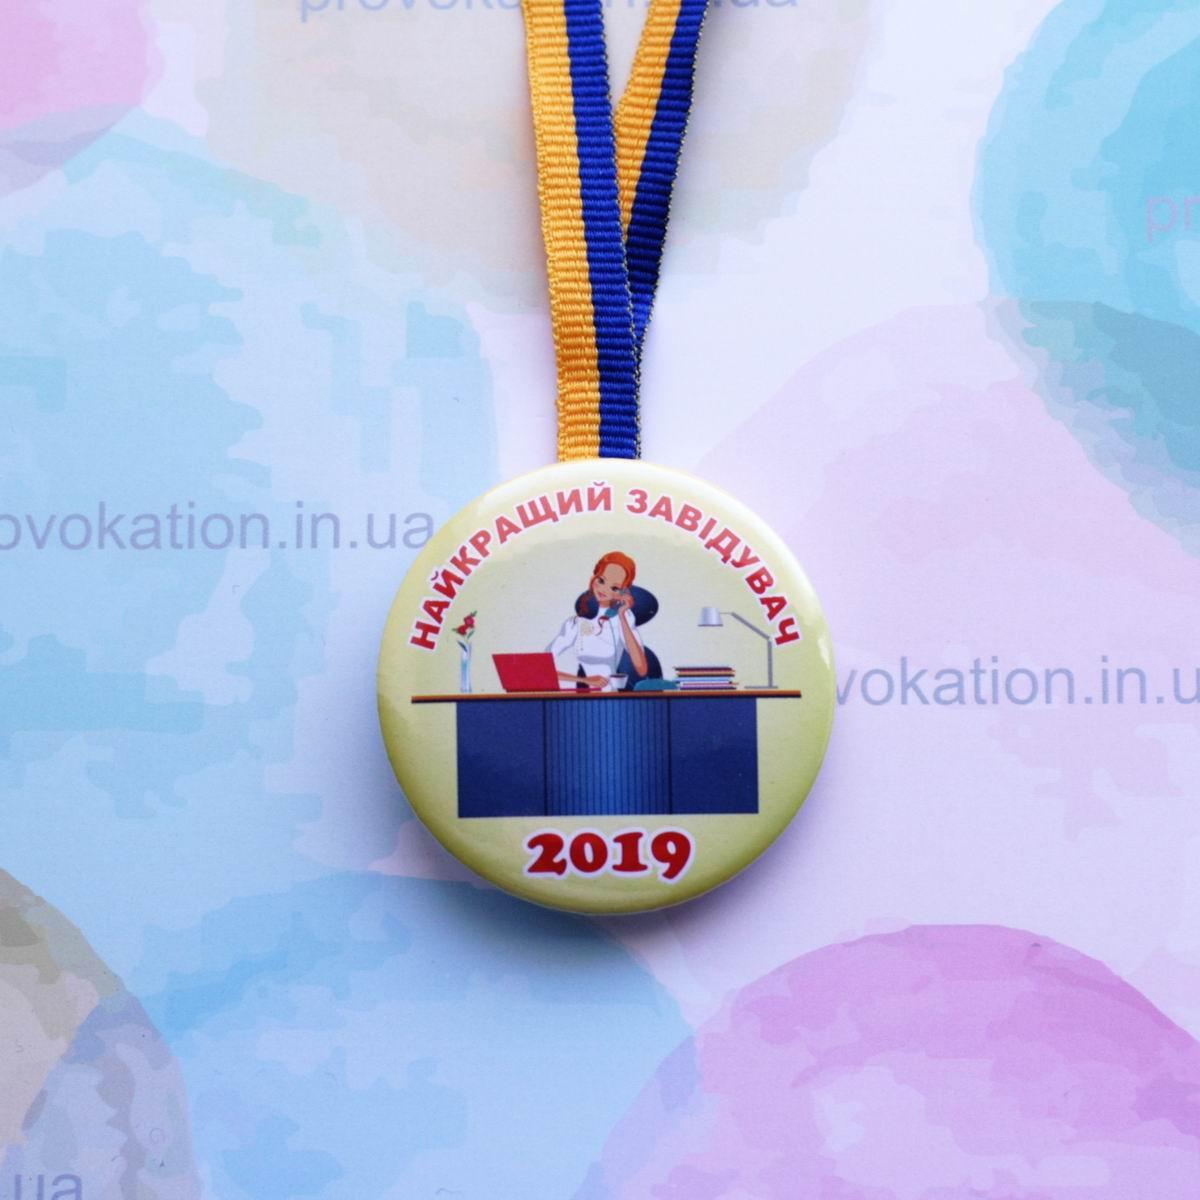 Медаль Заведующей детского сада (медаль Завідуючій дитячого садка), 58мм